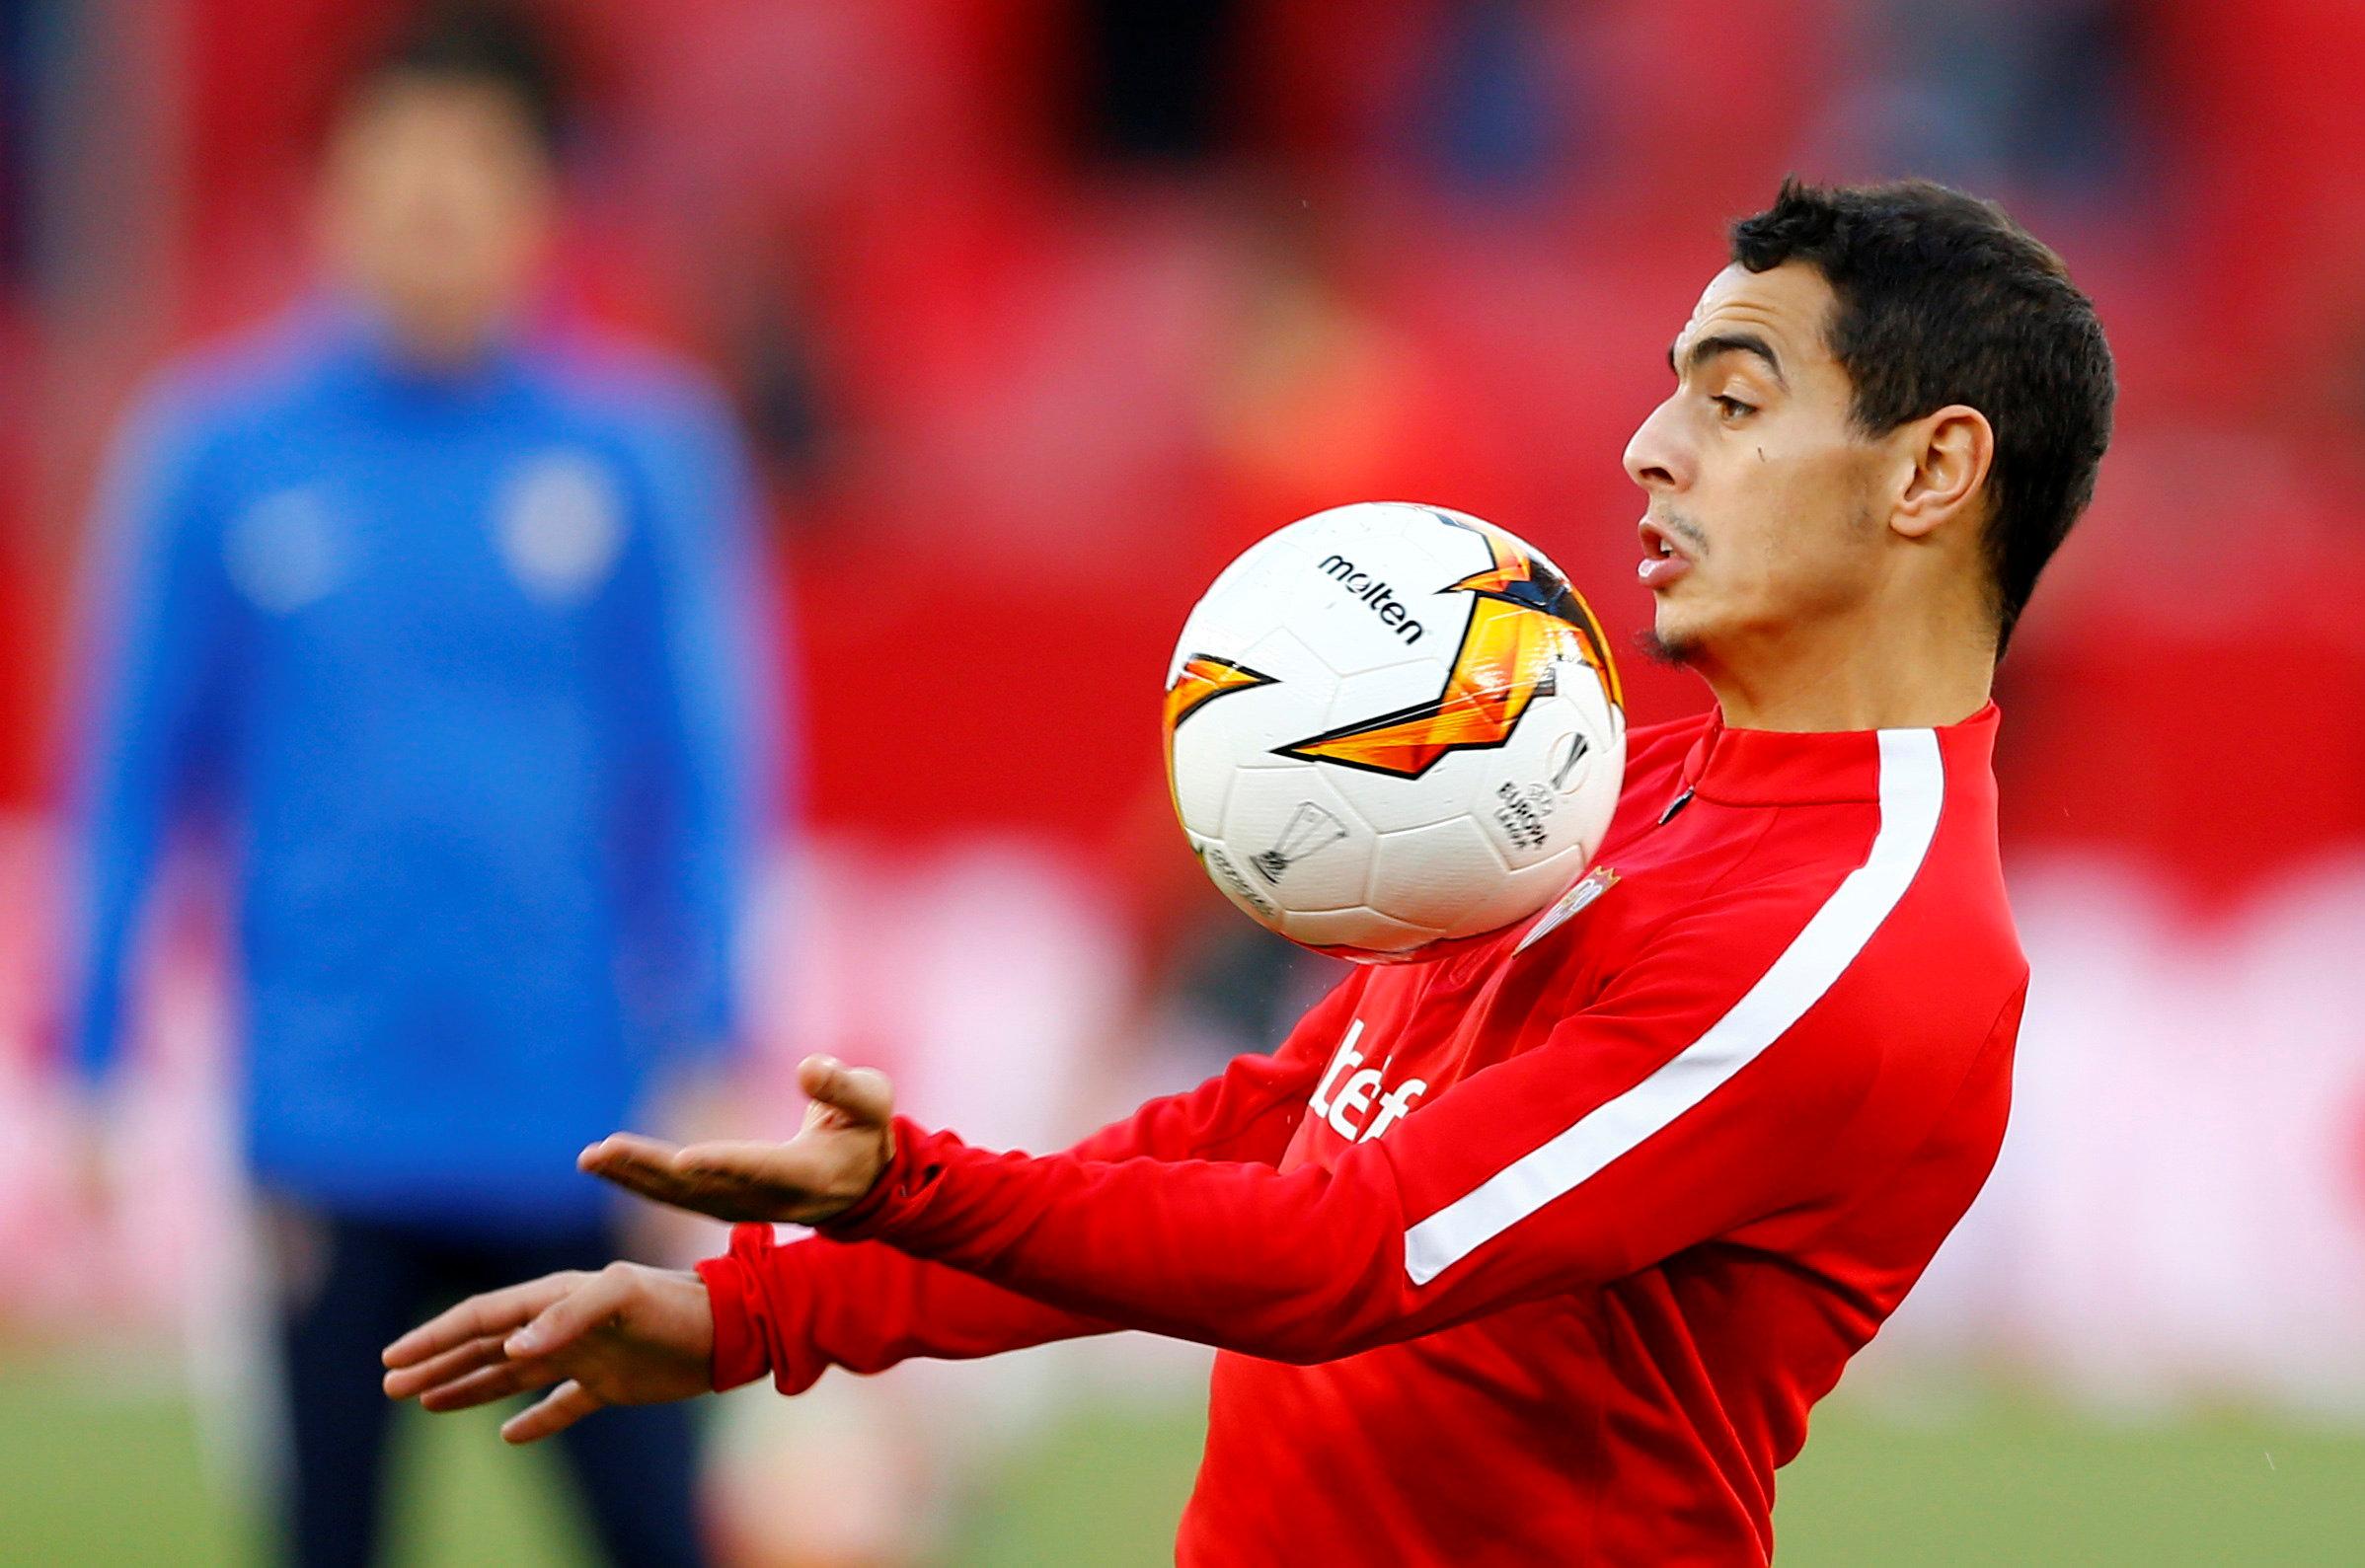 Football - Transferts - Ben Yedder à l'AS Monaco : un mariage de raison